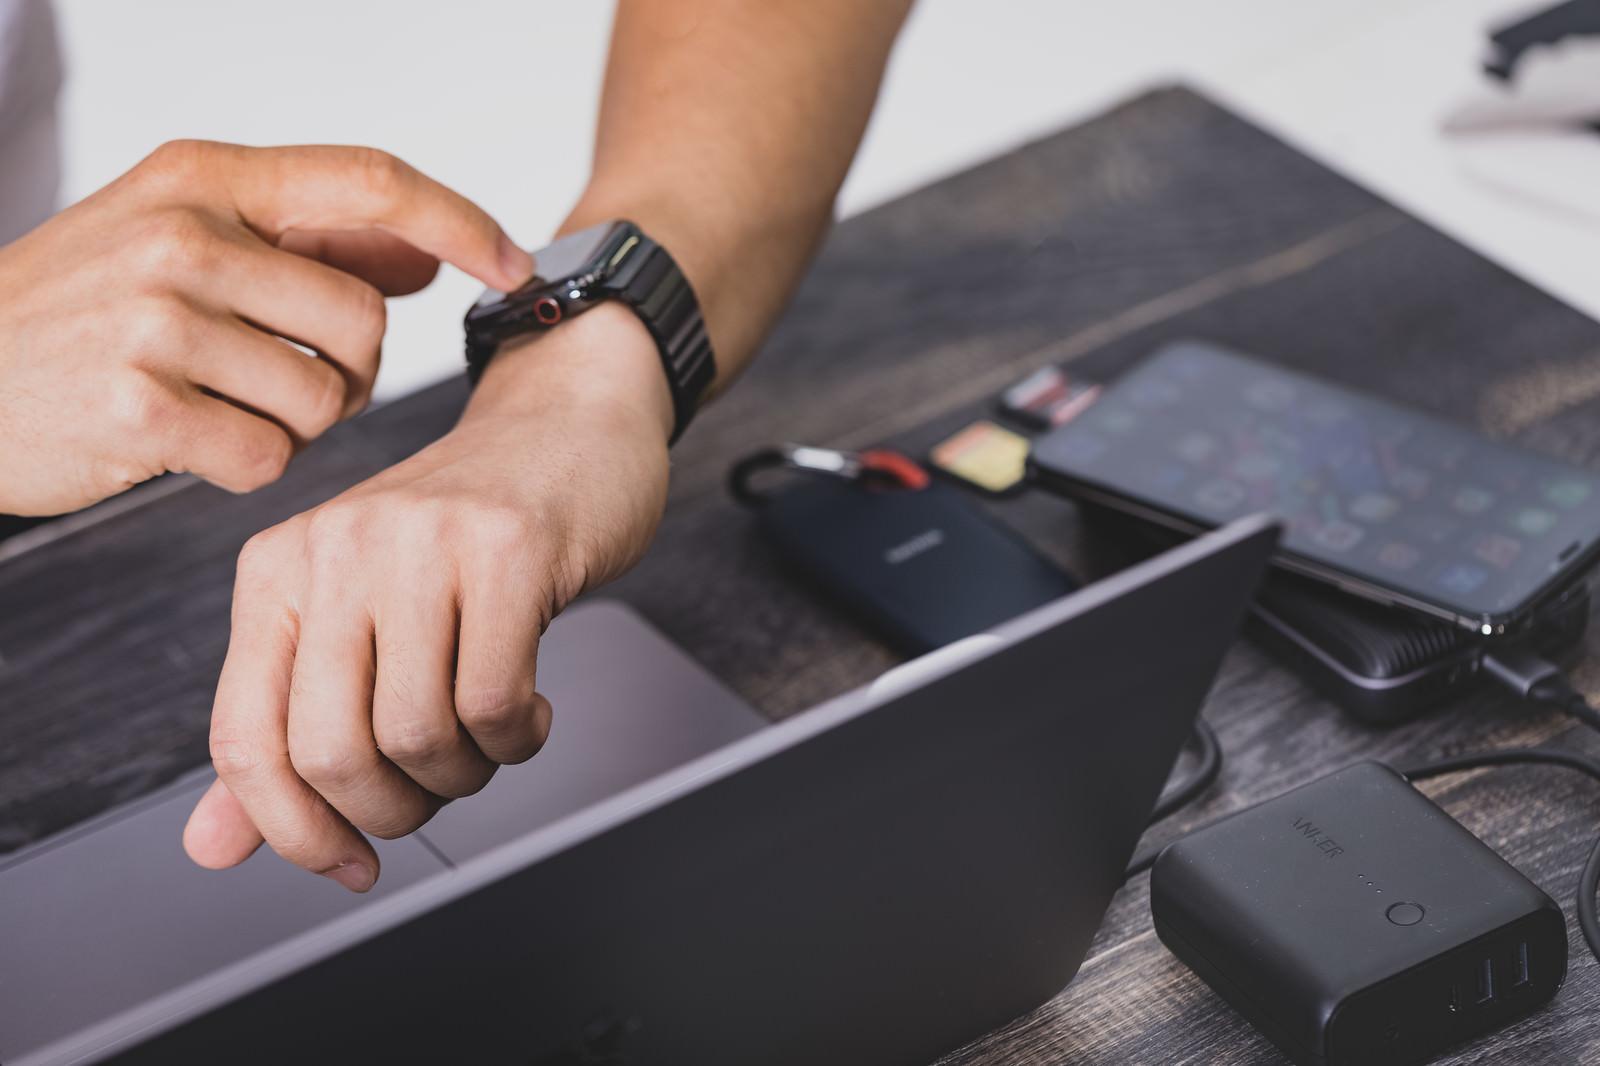 「Apple Watchで不要な通知をオフにする」の写真